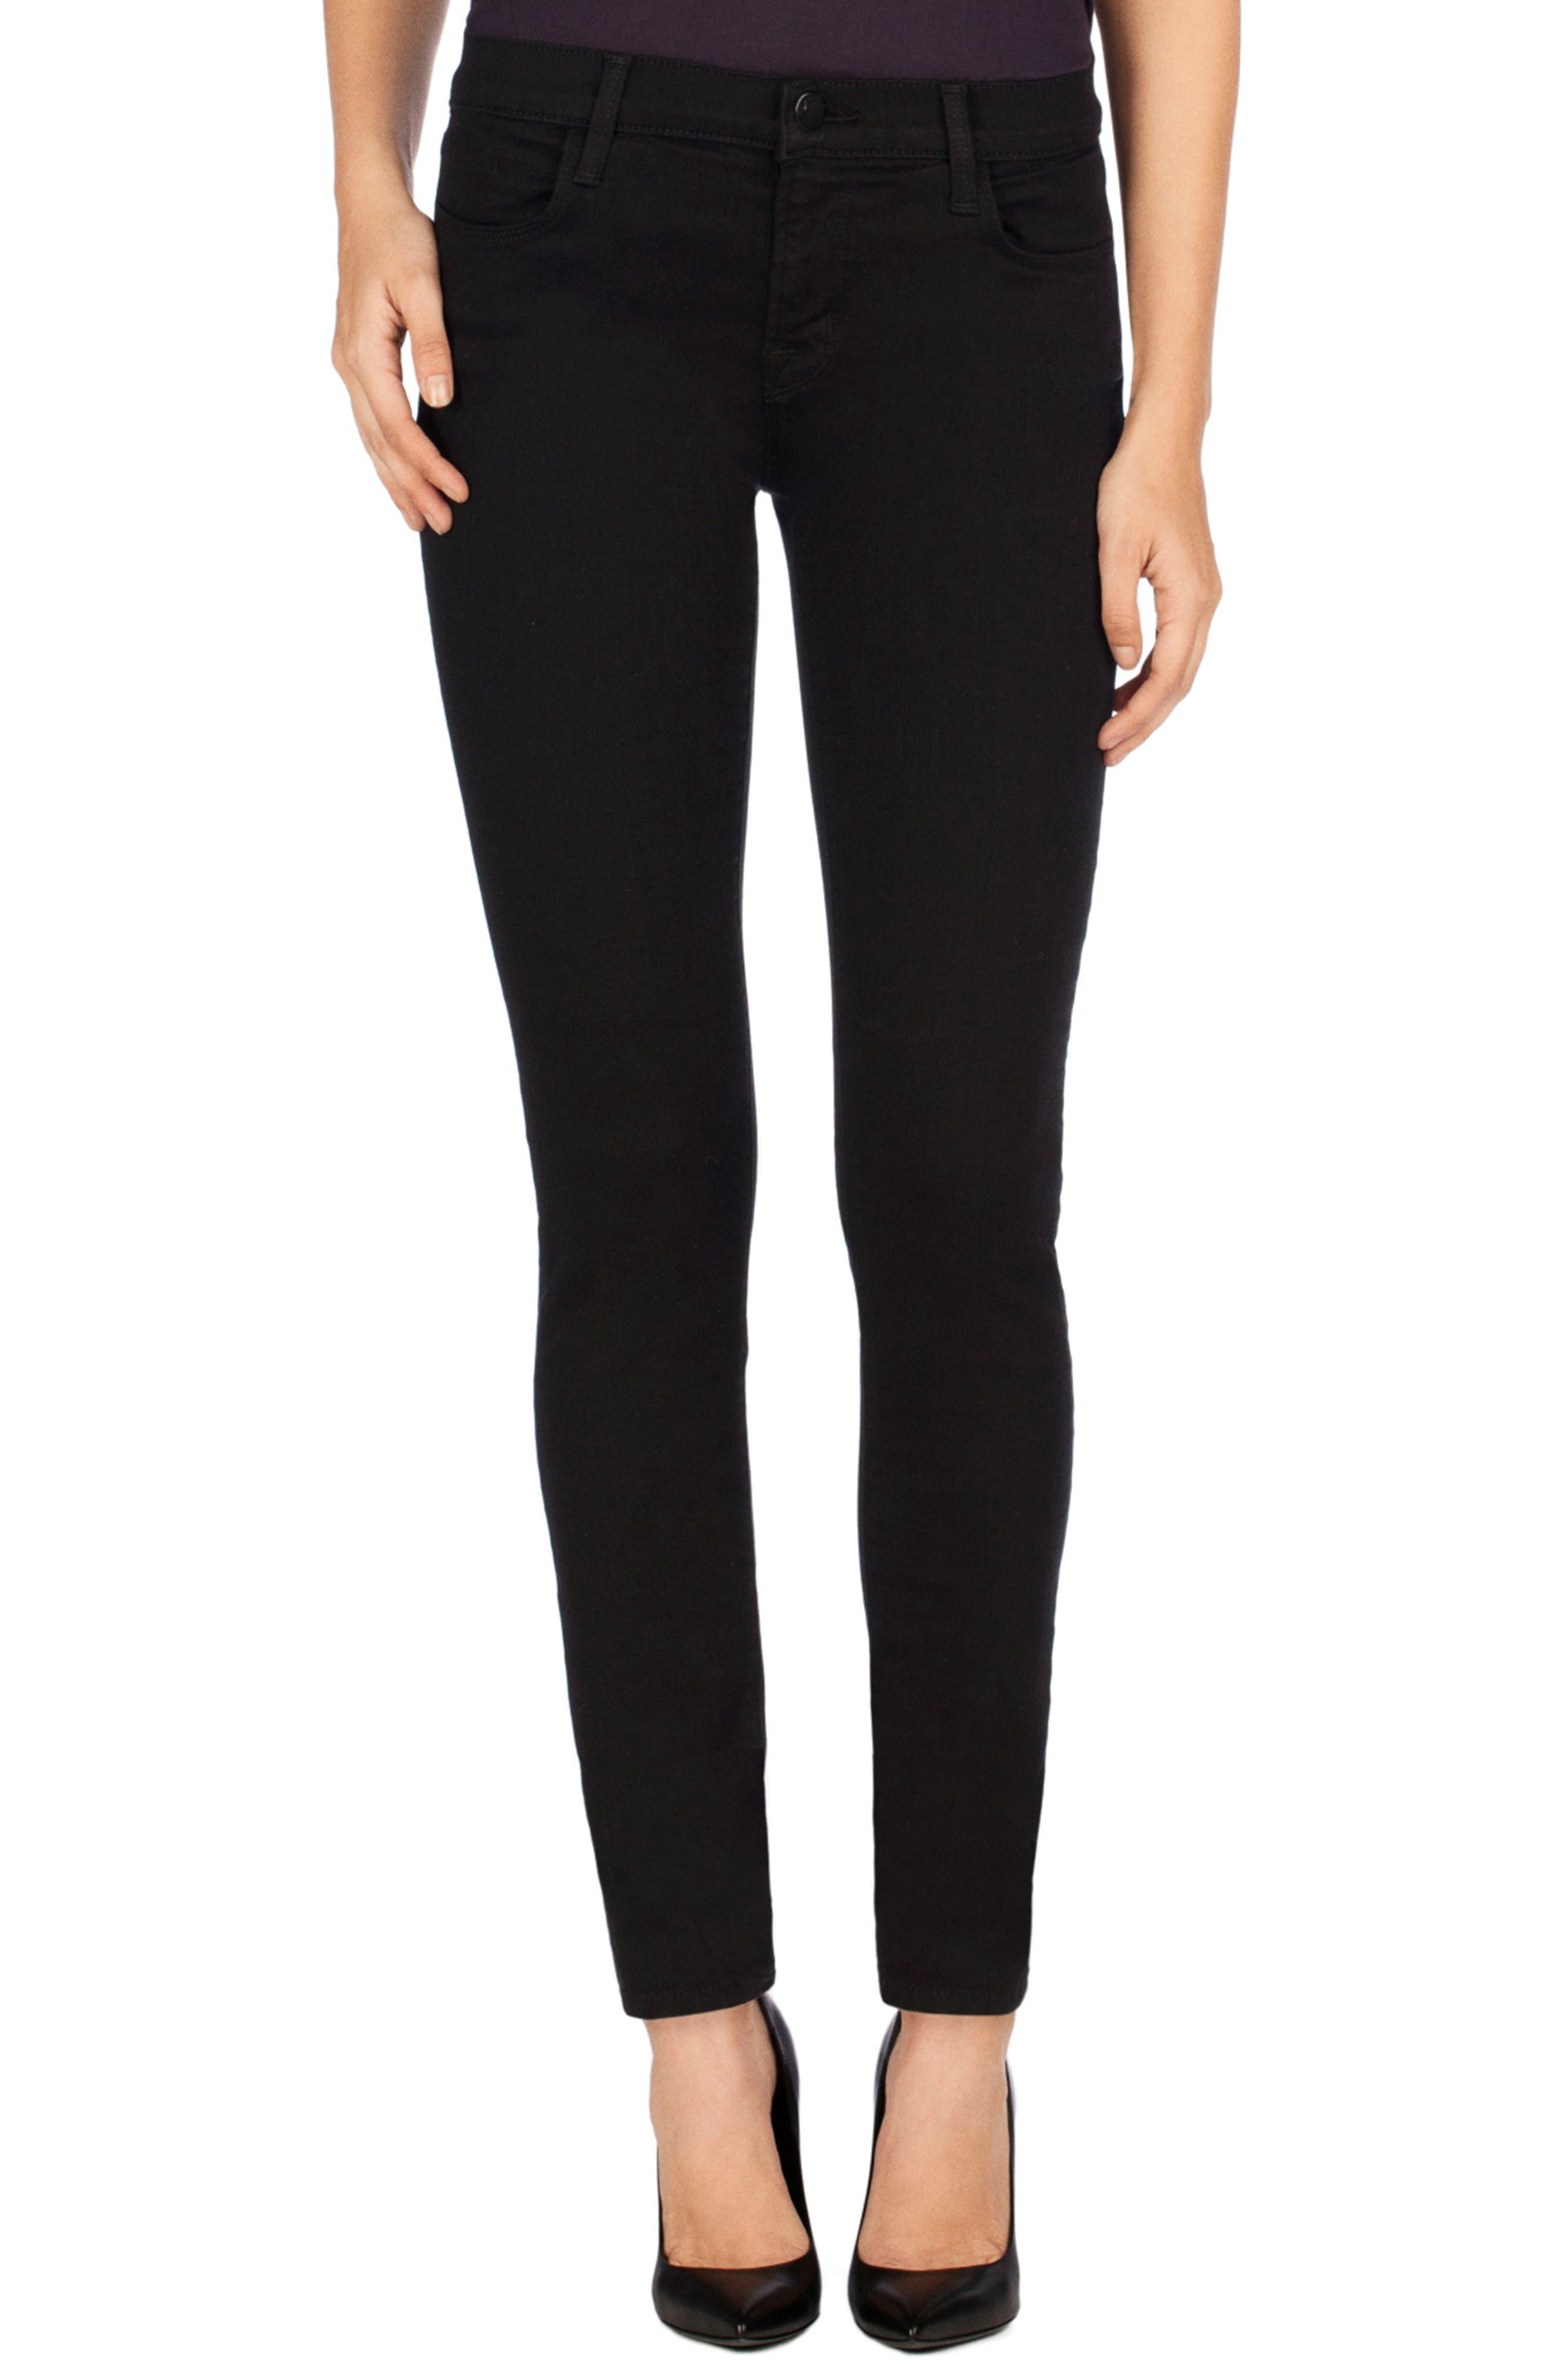 J BRAND,                             Super Skinny Jeans,                             Main thumbnail 1, color,                             SERIOUSLY BLACK